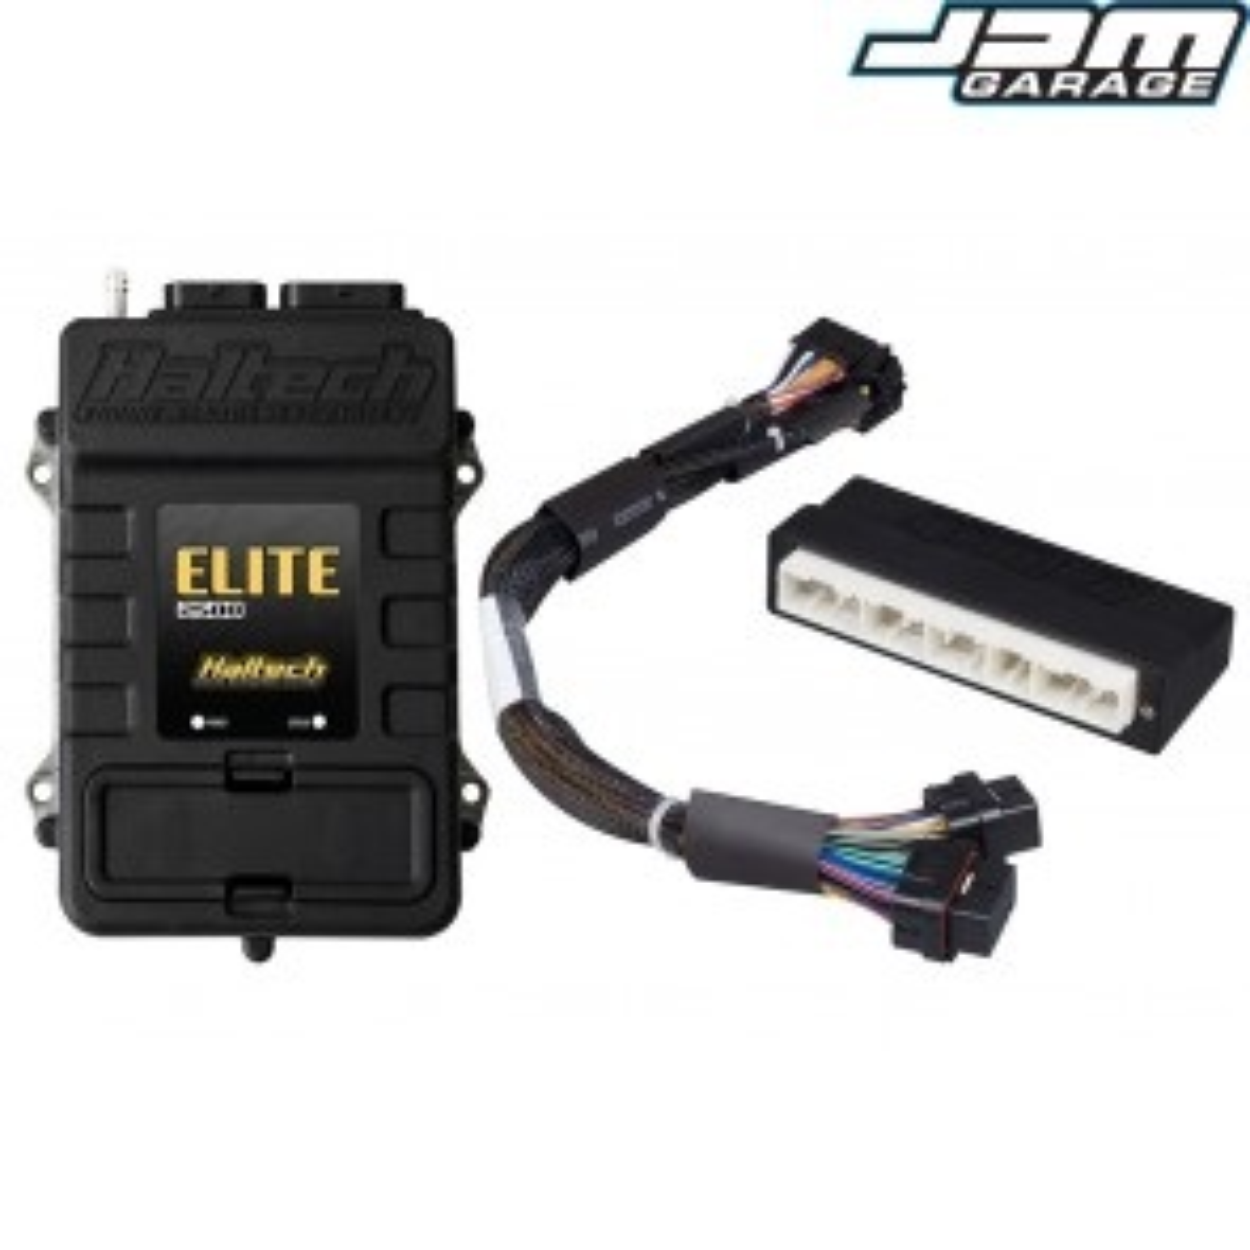 Haltech Elite 2500+ ECU Subaru WRX MY06-10 With Plug 'n' Play Adaptor Harness Kit